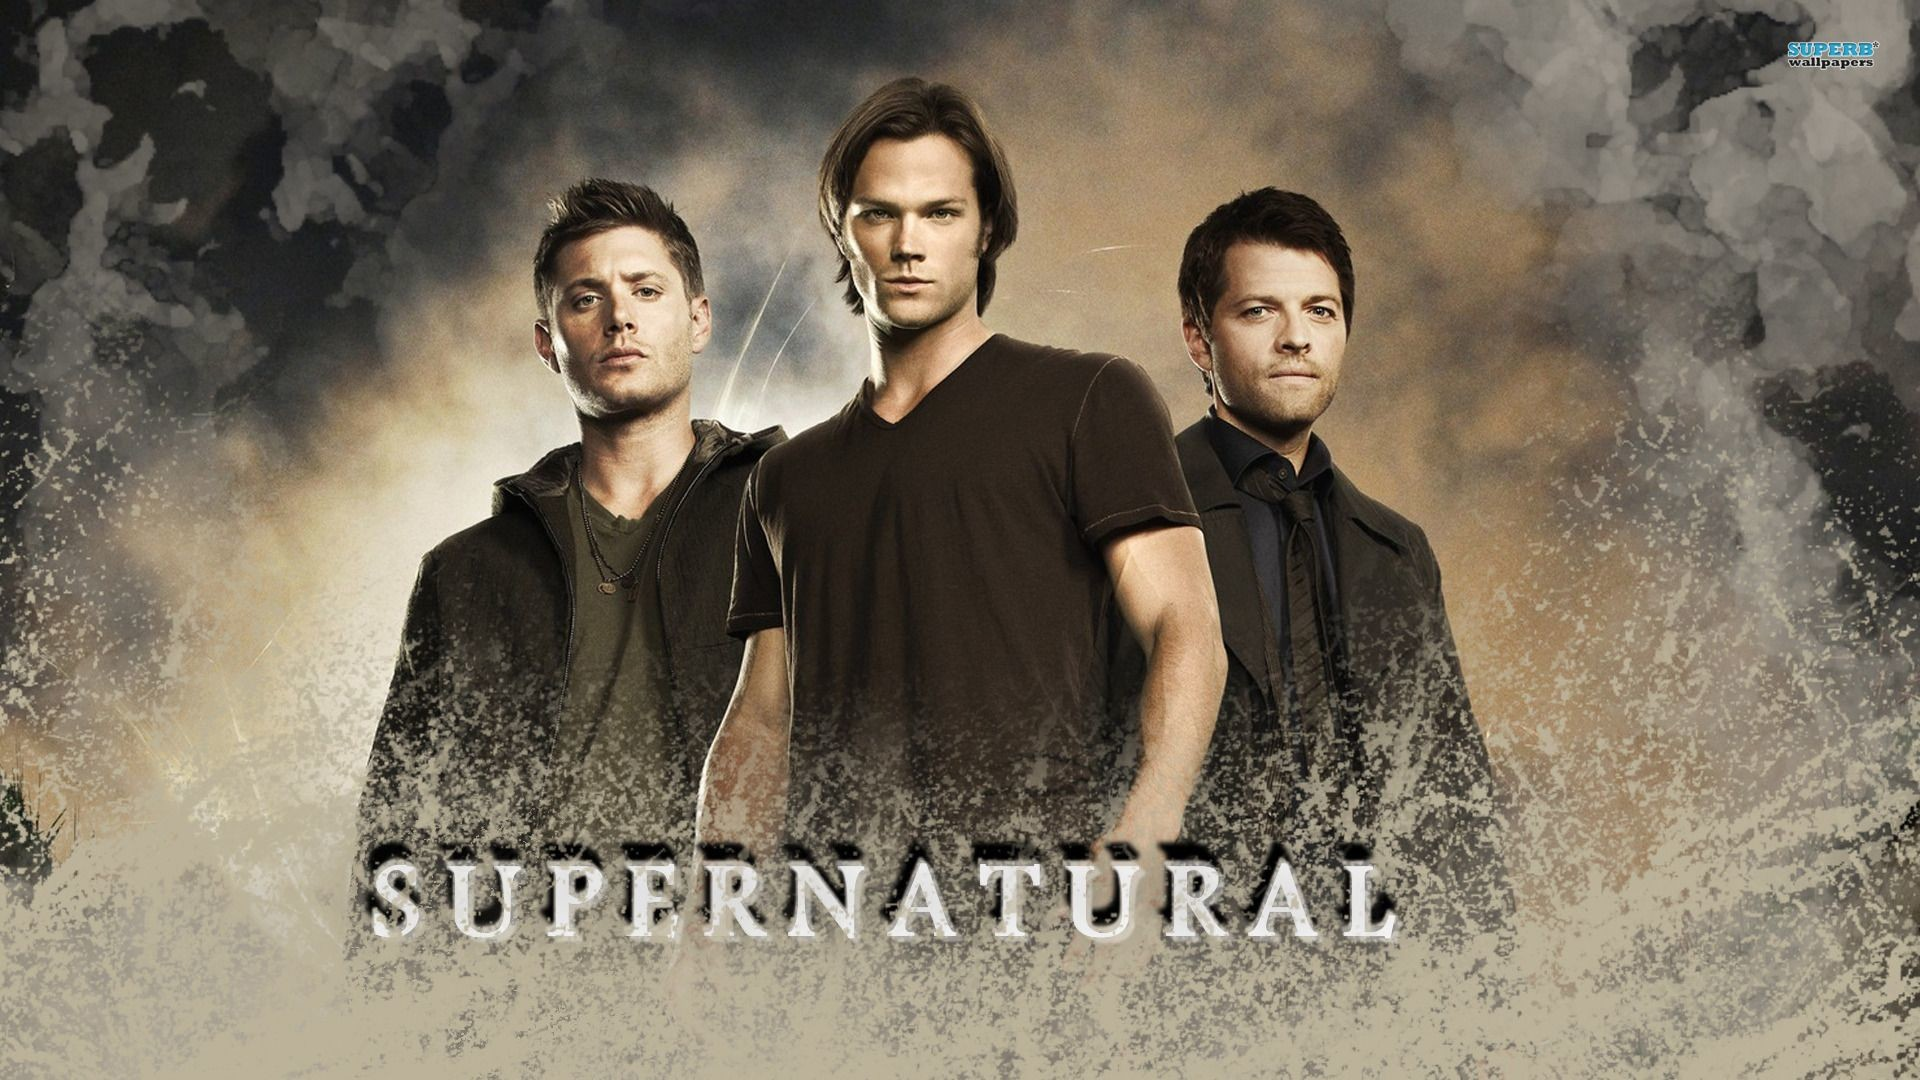 supernatural-desktop-wallpapers-hd-1920×1080-sam-dean-castiel.